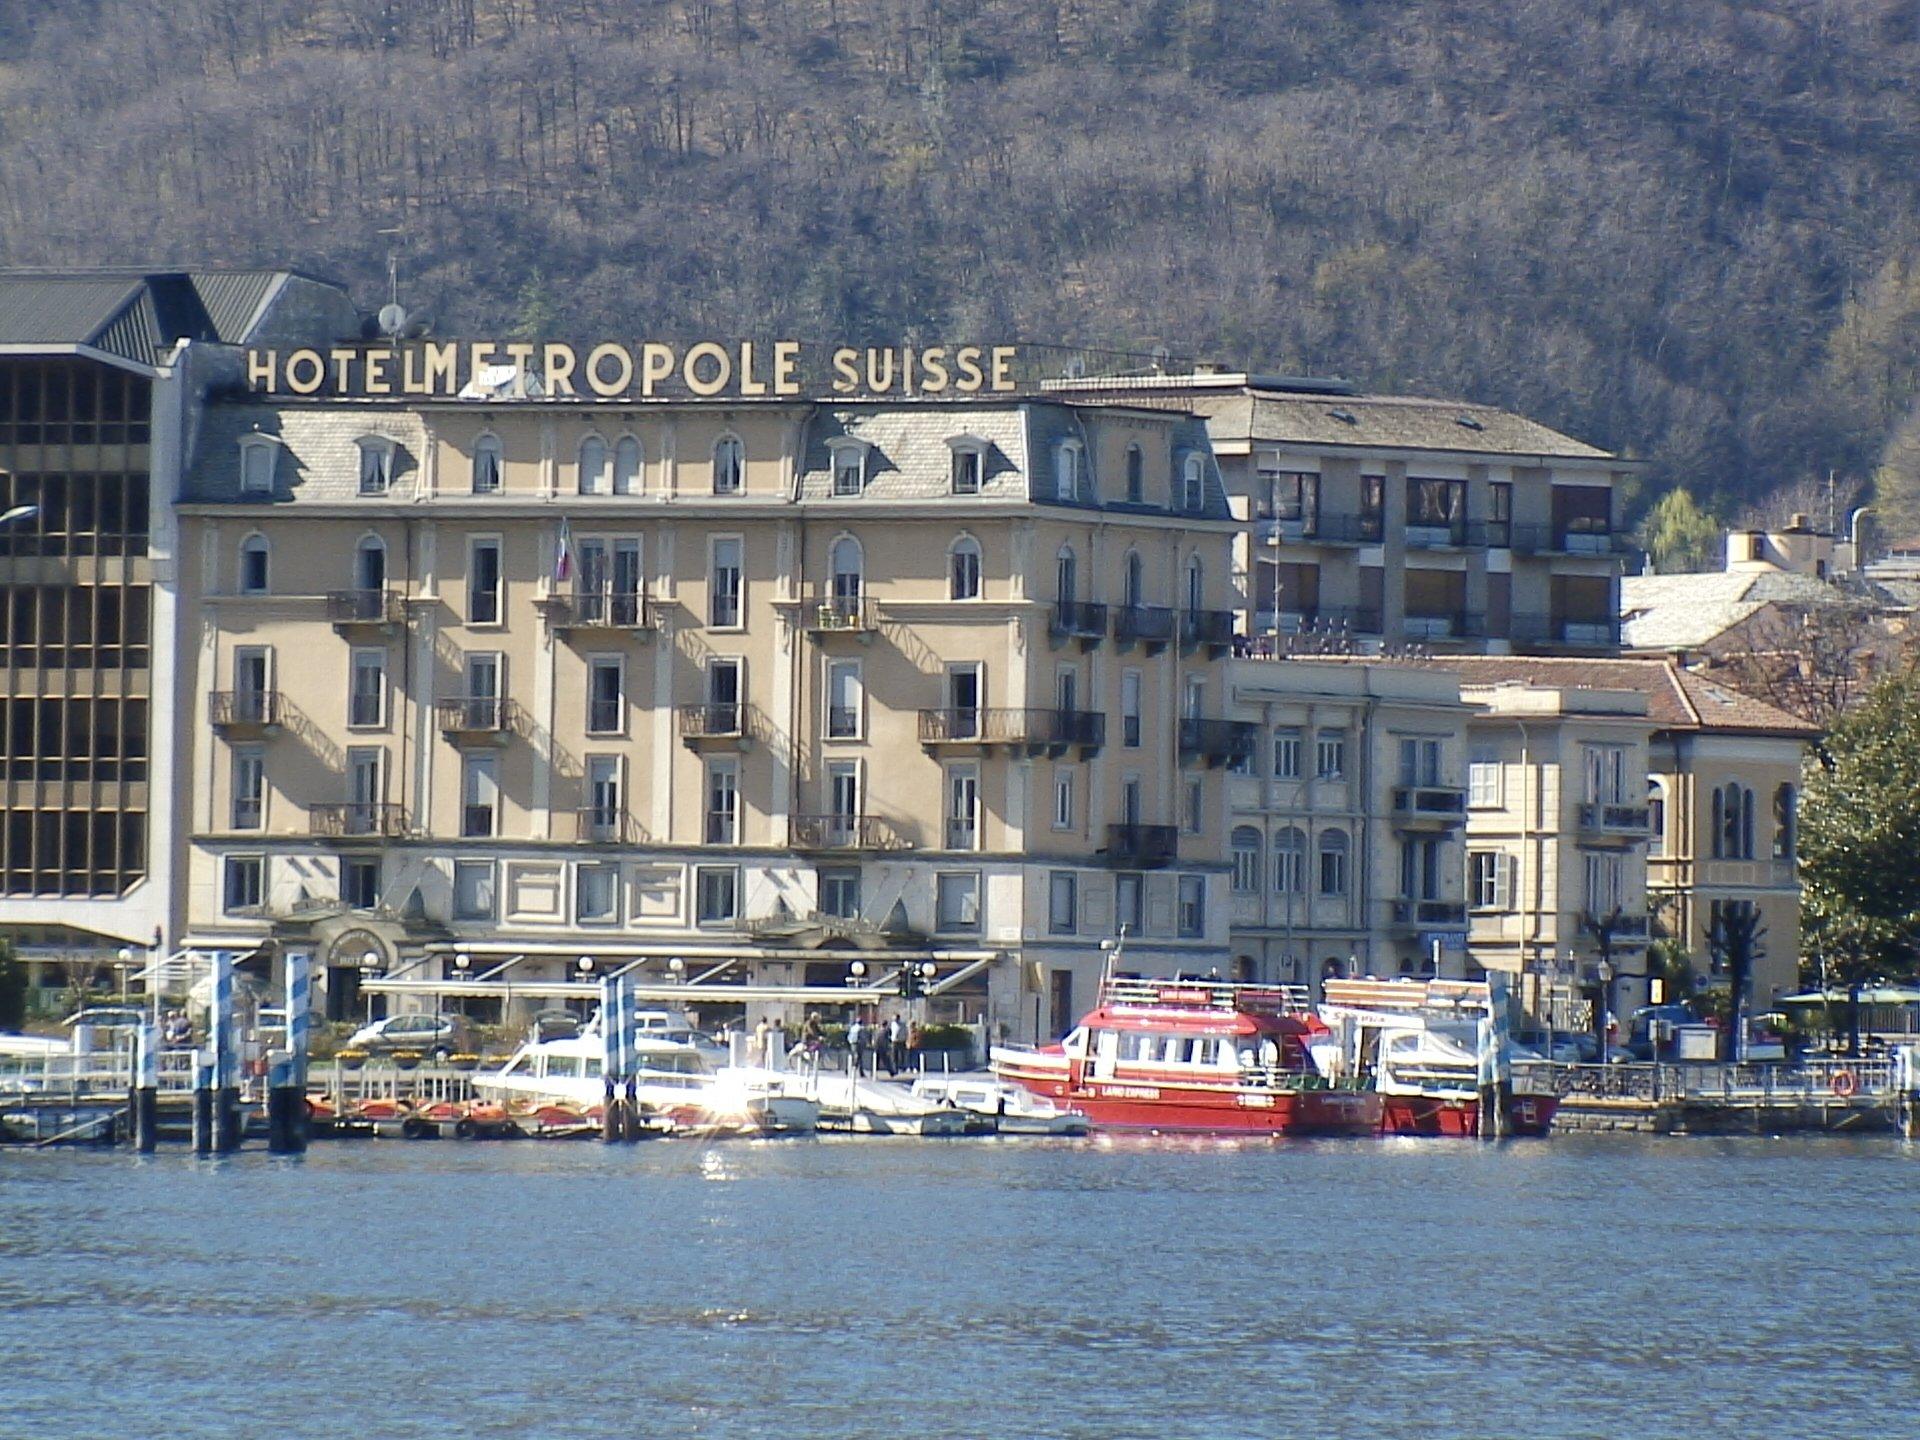 هوتل متروبول سويس